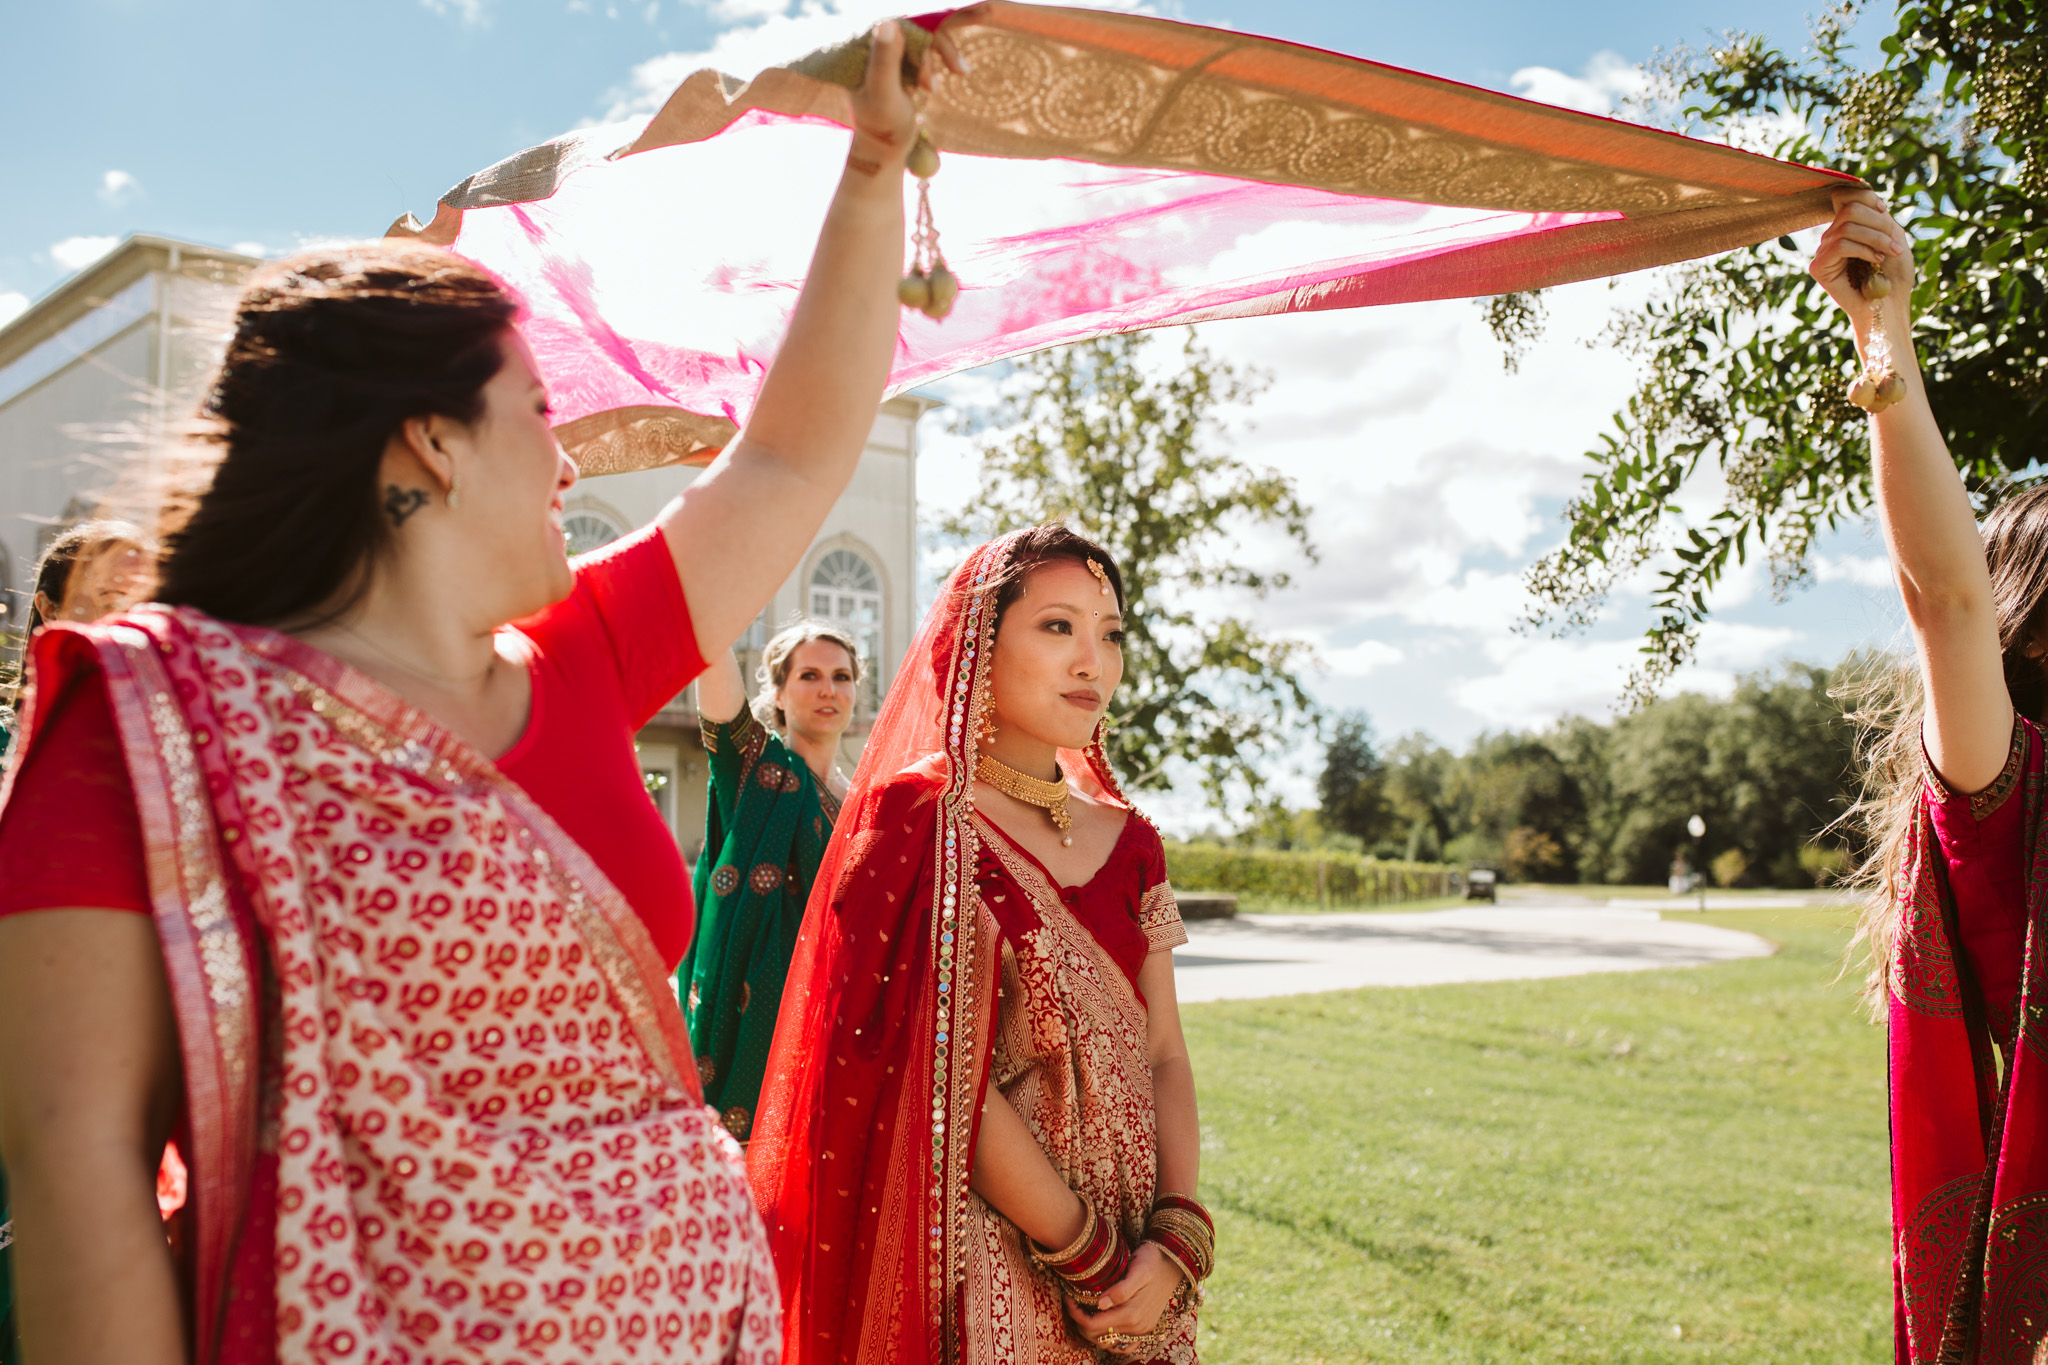 rebeccaburtphotography.hindiwedding.moraisvineyards.virginiawedding-121.JPG